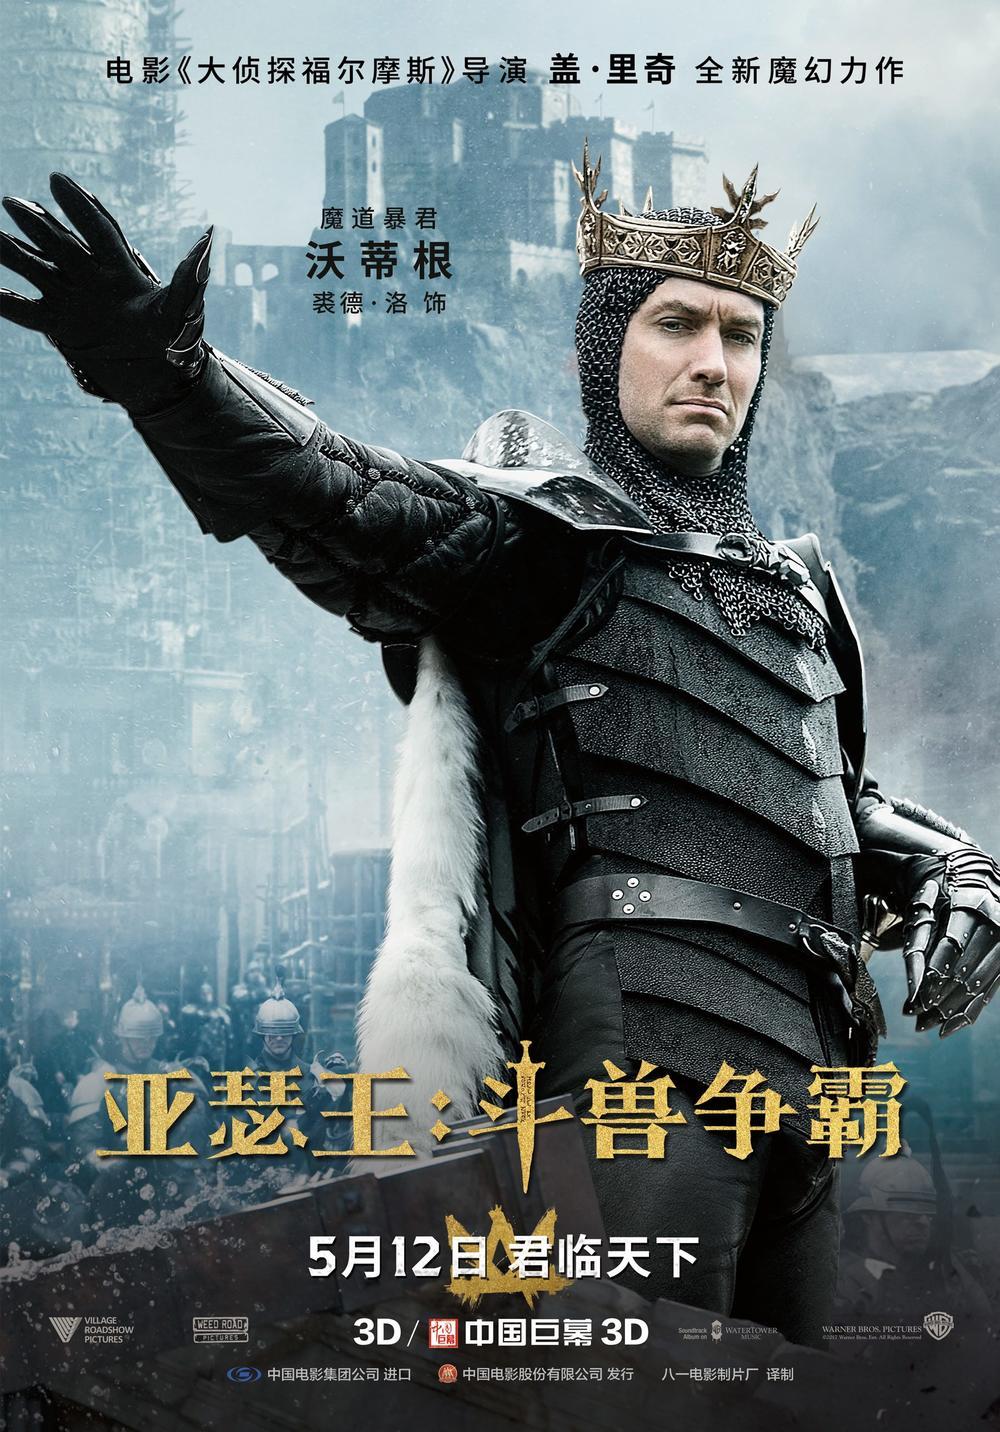 King arthur a beloved hero